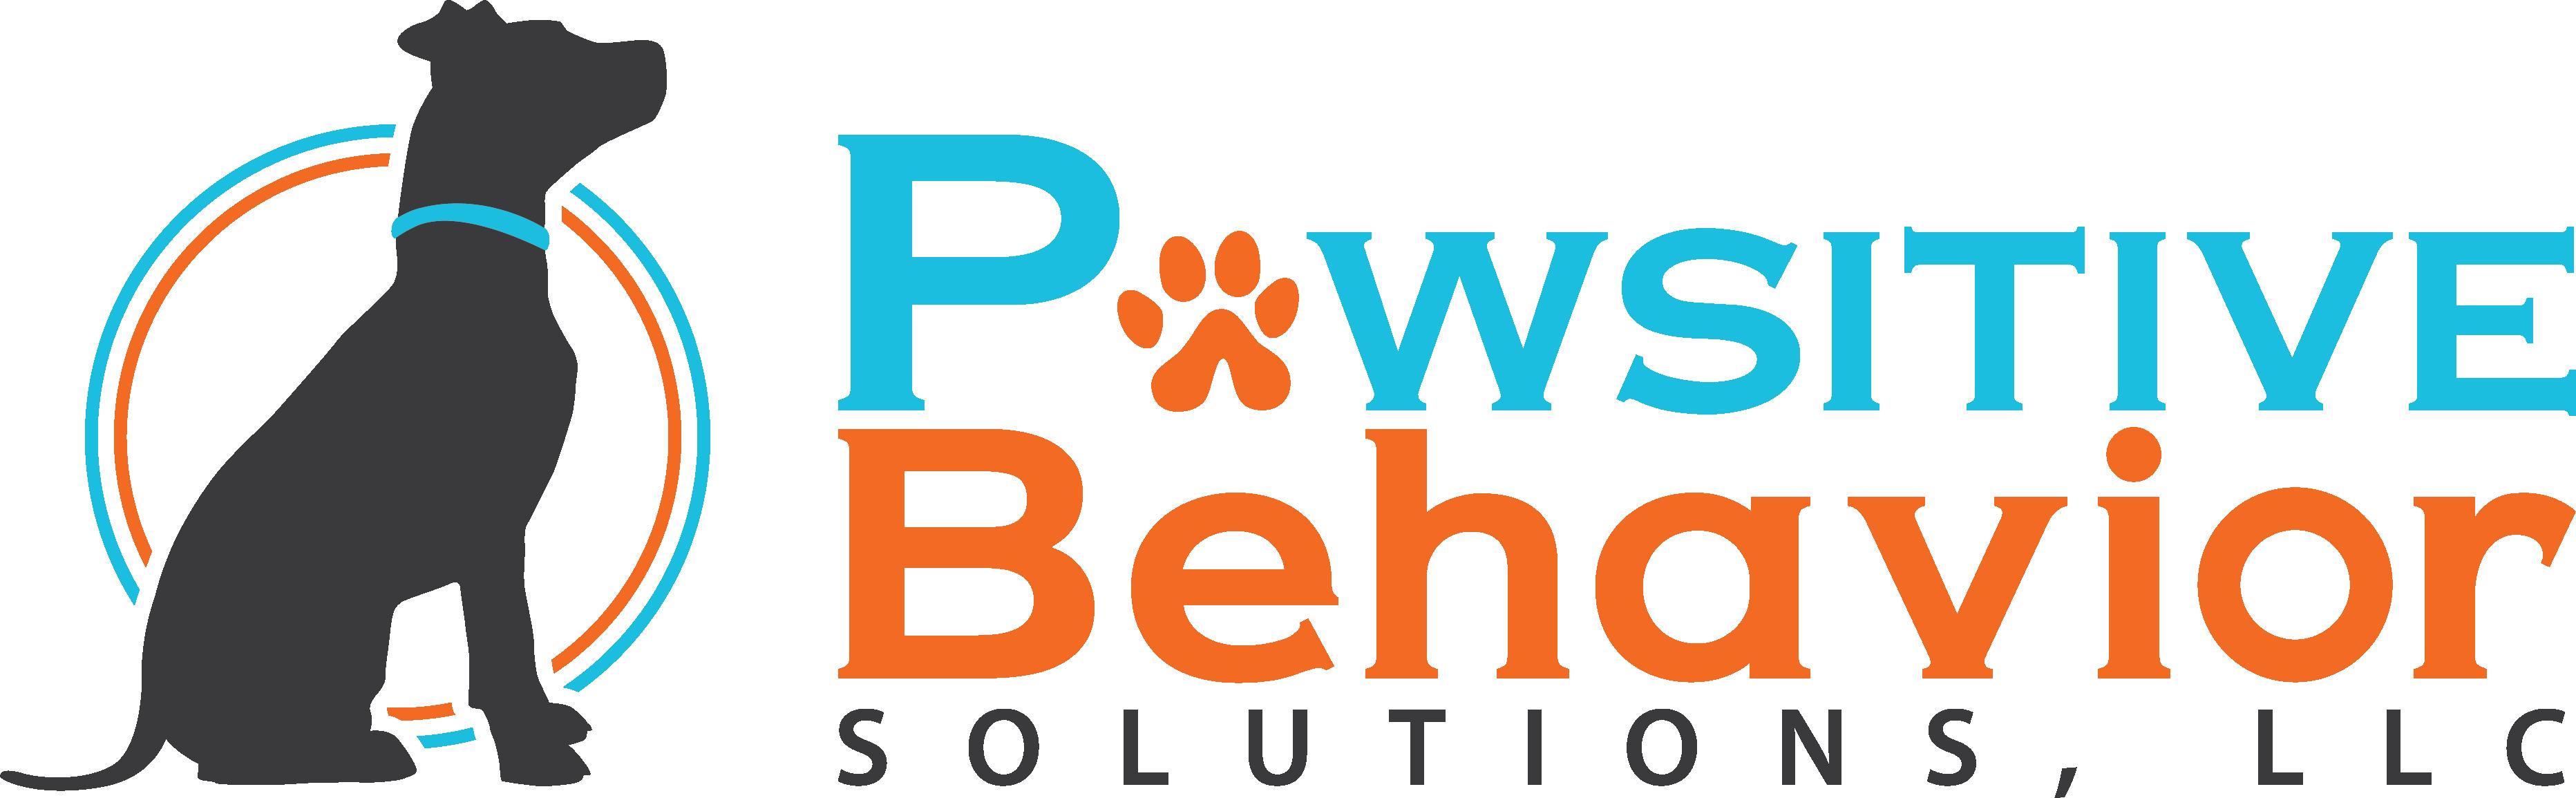 Pawsitive Behavior Solutions